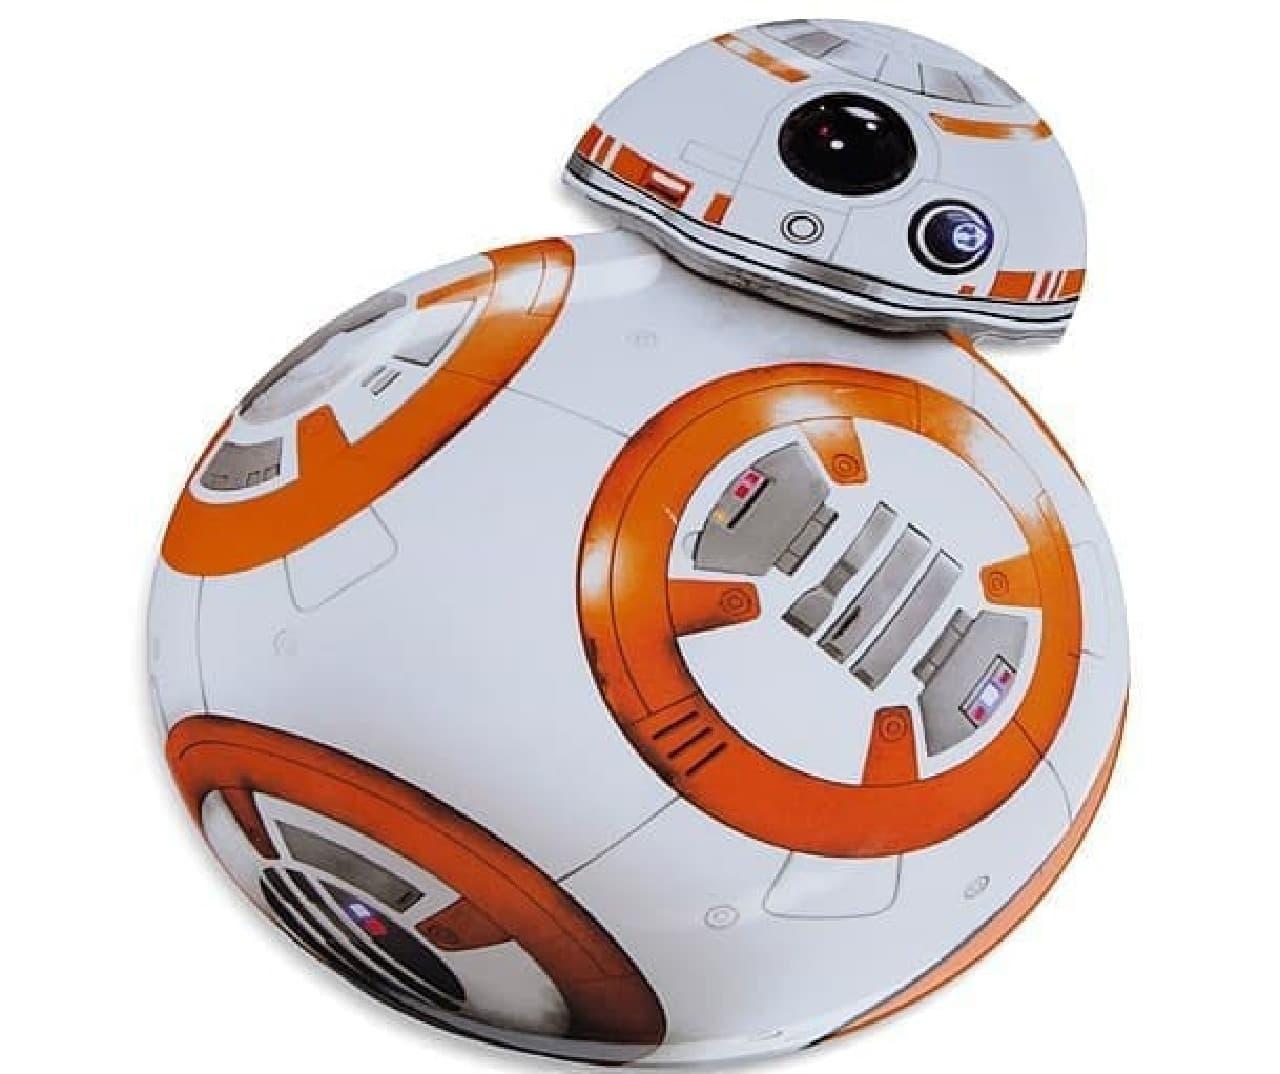 「BB-8」デザインのお皿「Star Wars BB-8 Serving Platter」  実用的ですよ!